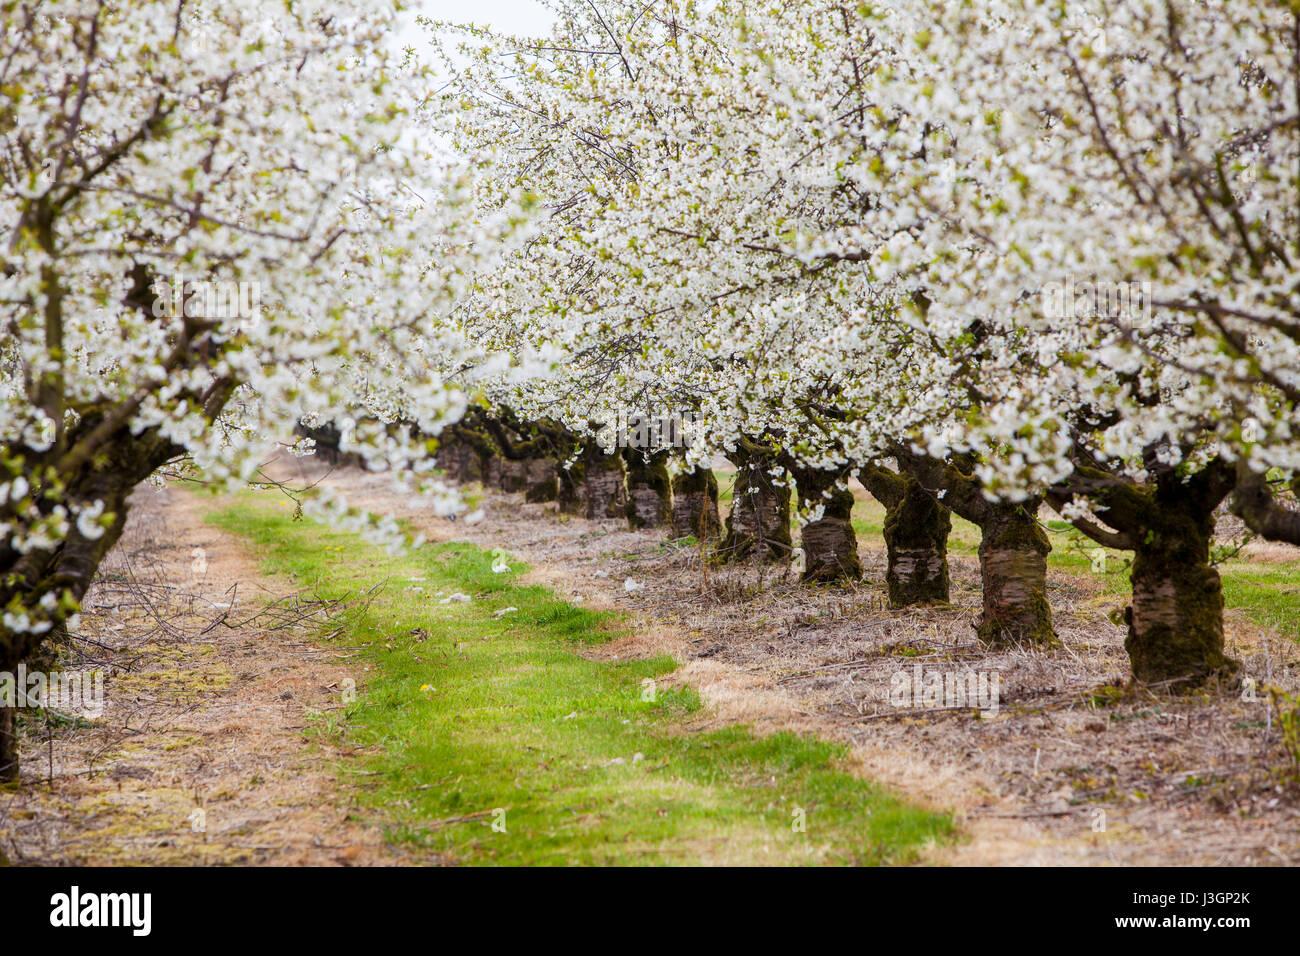 Blossoming cherry (Prunus sp.) trees in spring, Weserbergland, Hesse, Germany, Europe Stock Photo